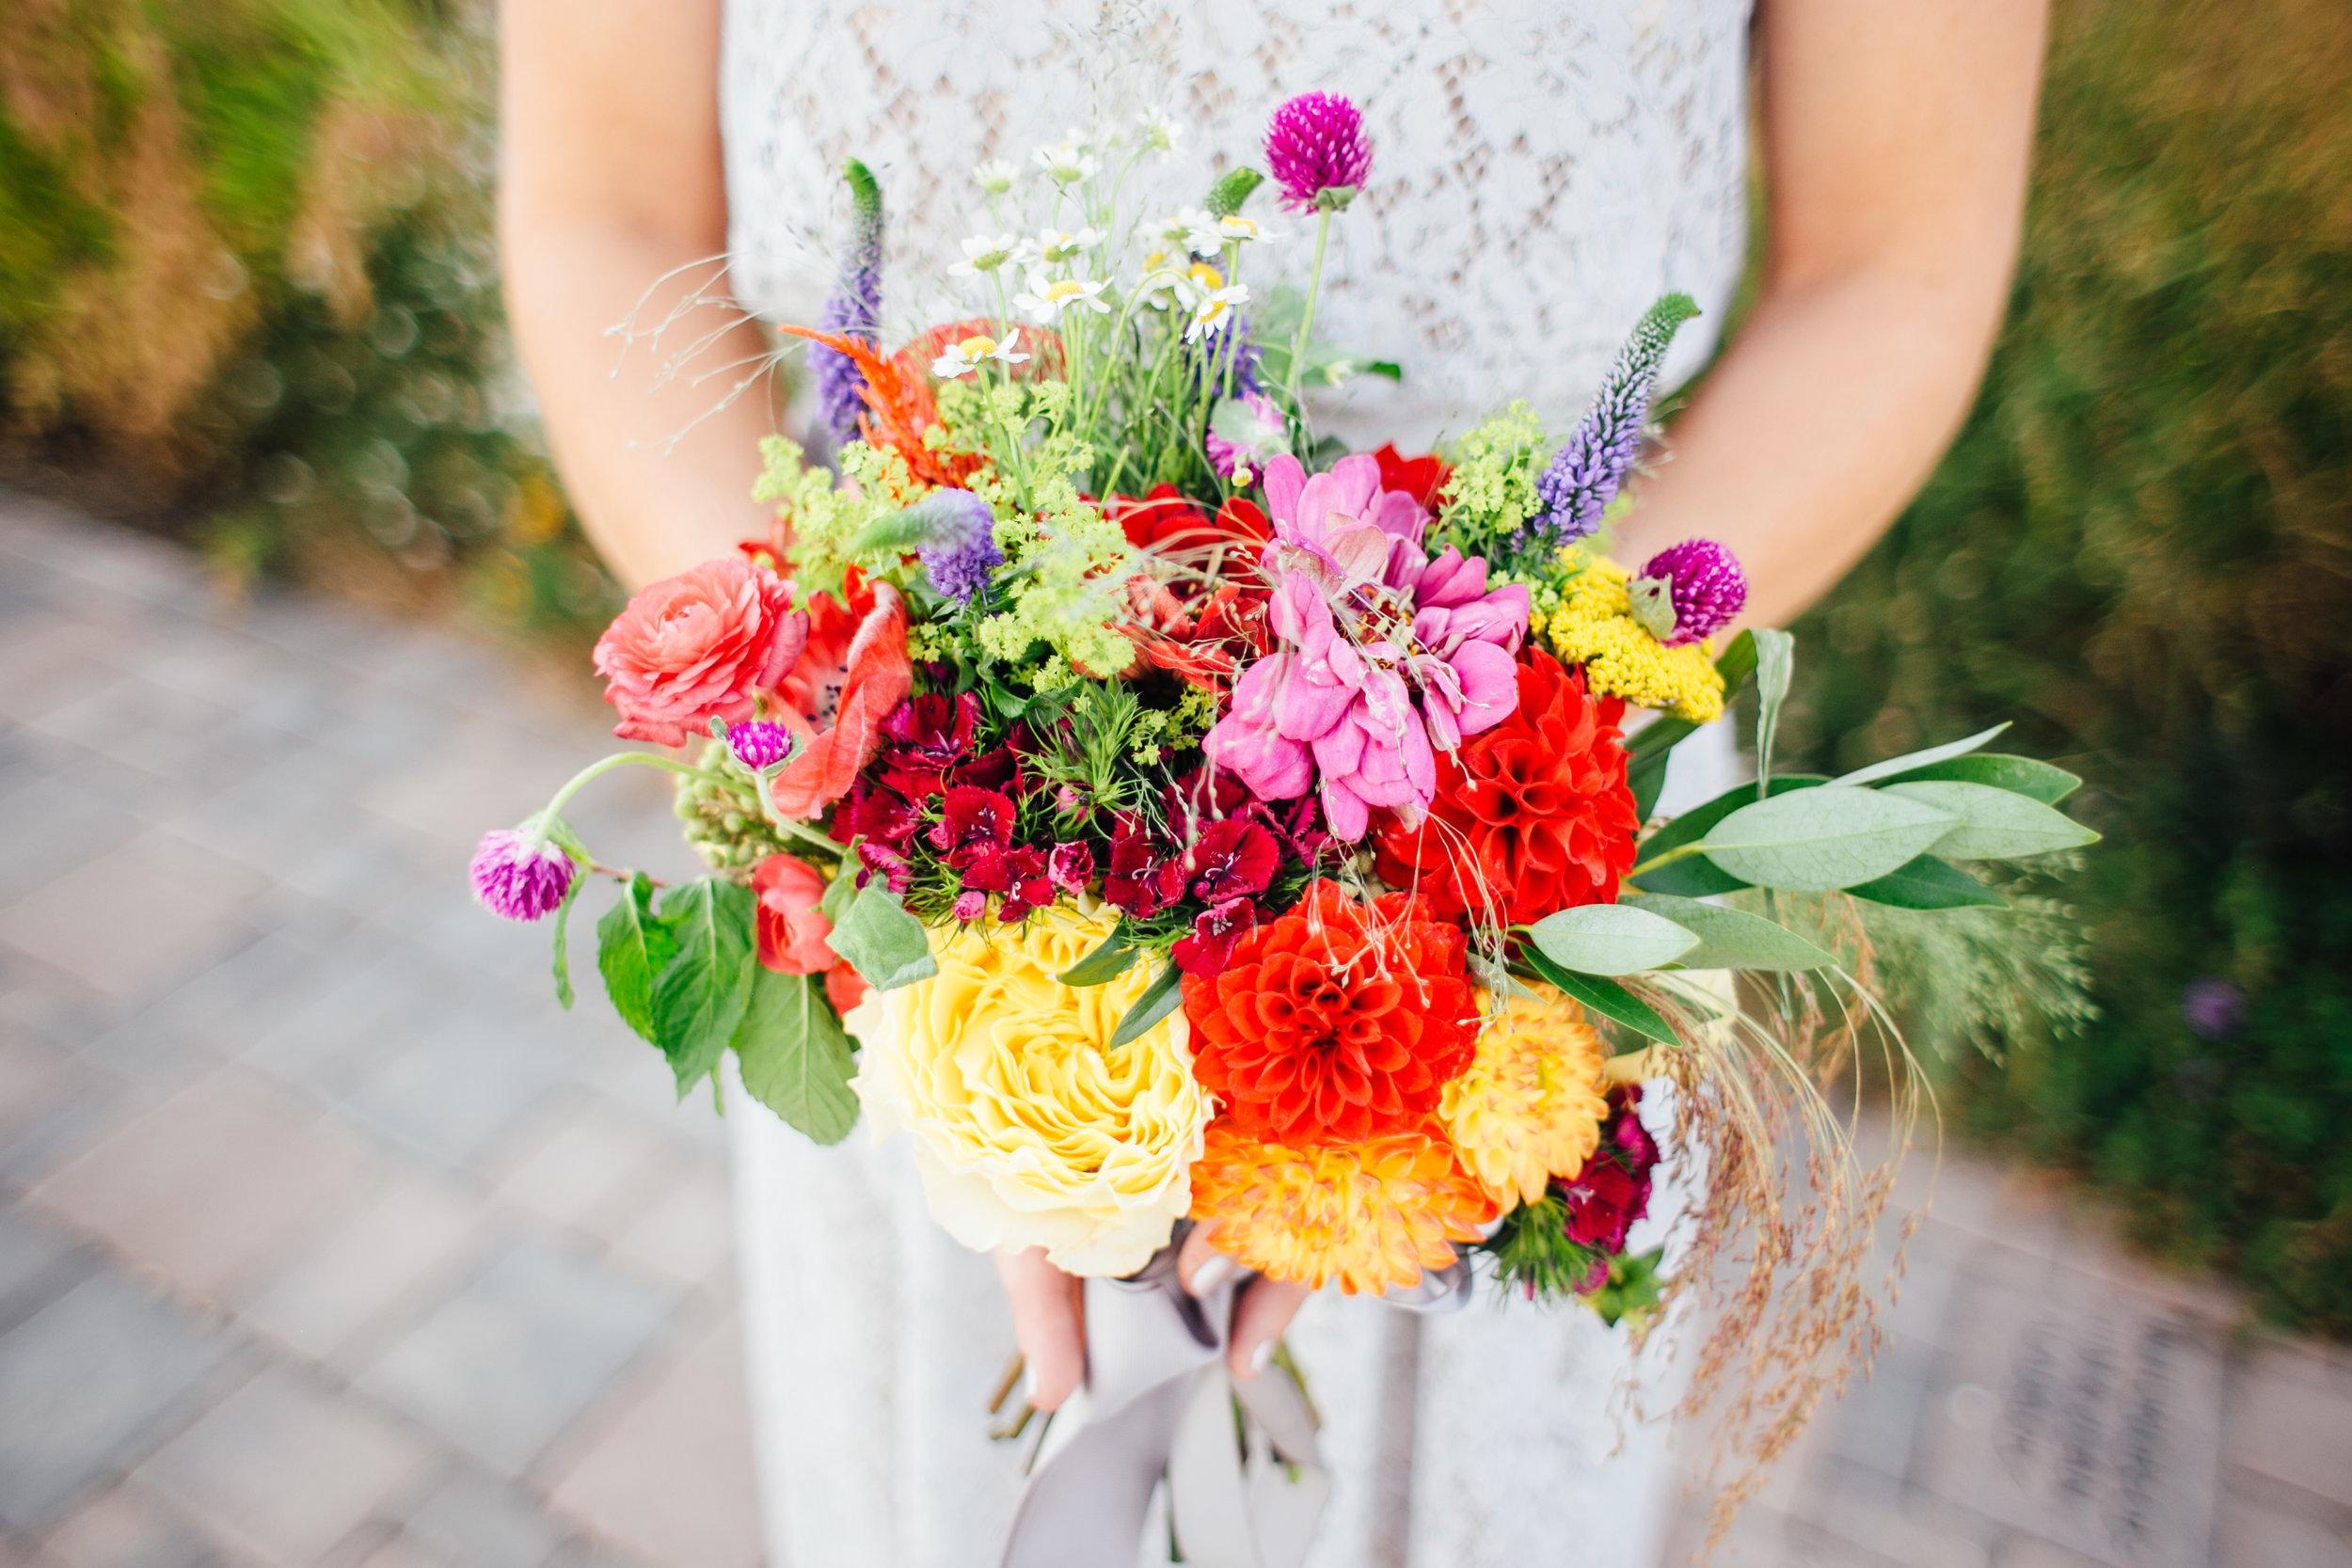 Bridesmaid's Bright Wedding Bouquet  Little Thompson Valley Pioneer Museum Berthoud Colorado Wedding